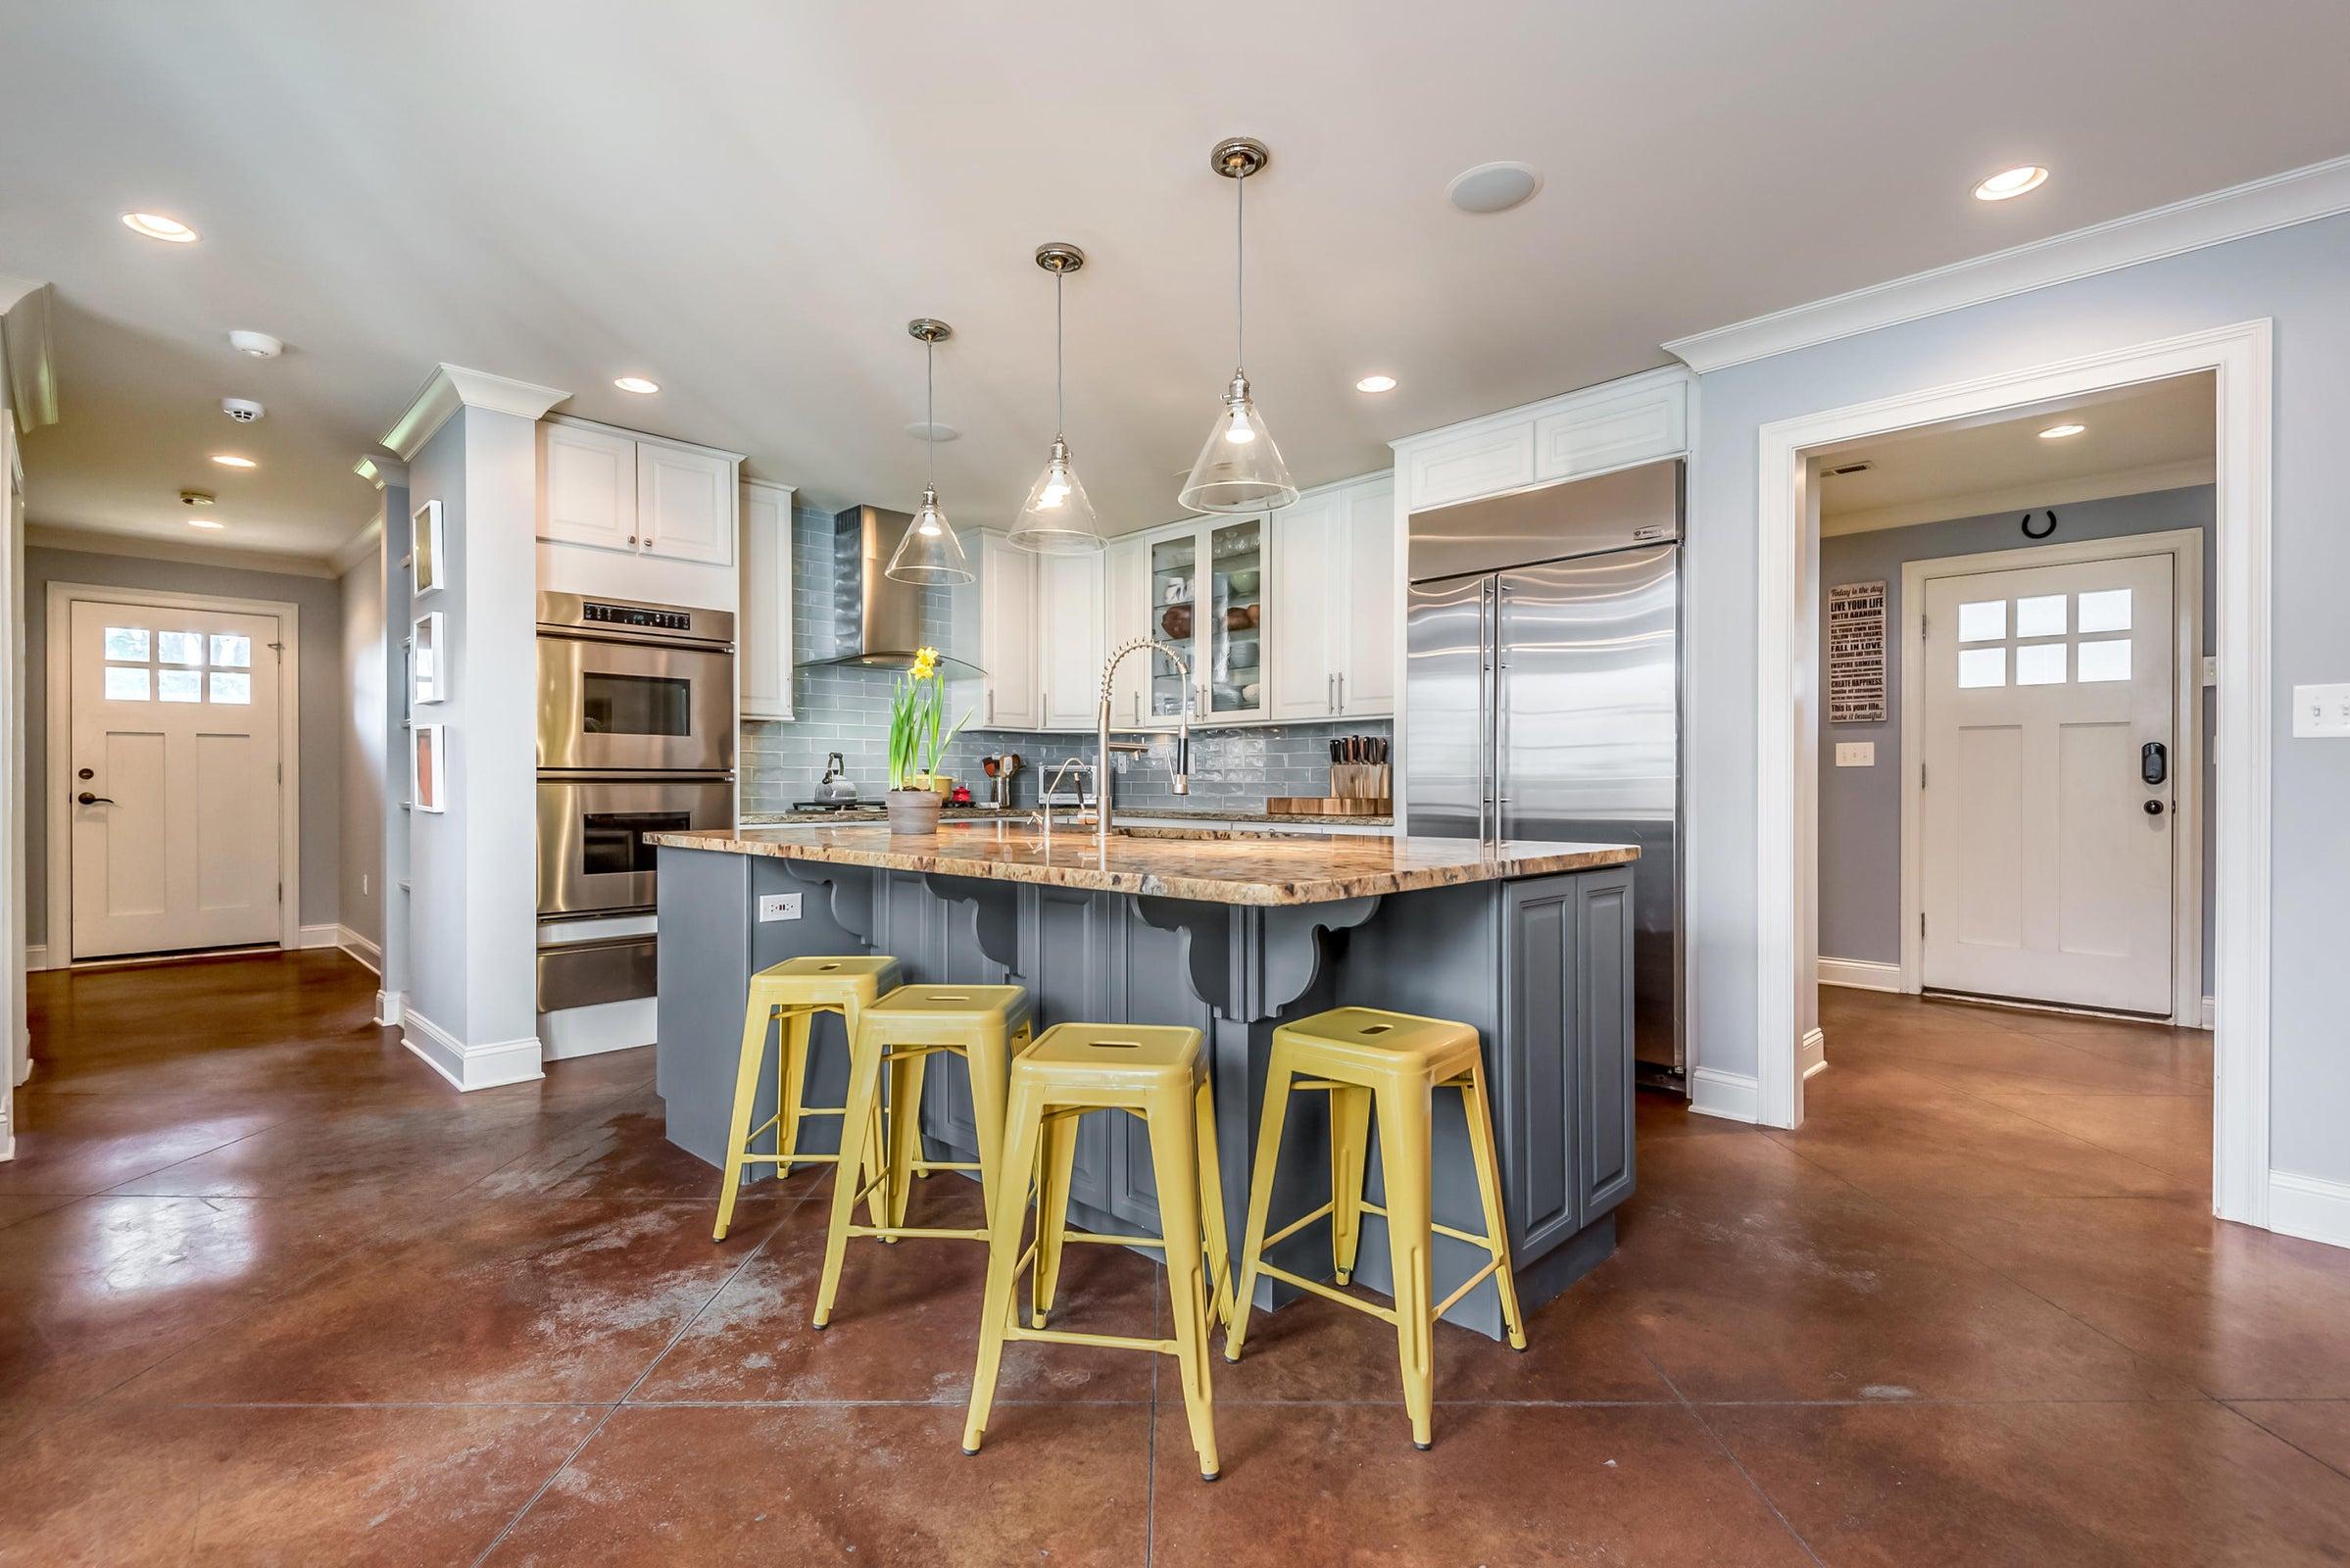 6612StoneMill-kitchen to mudroom